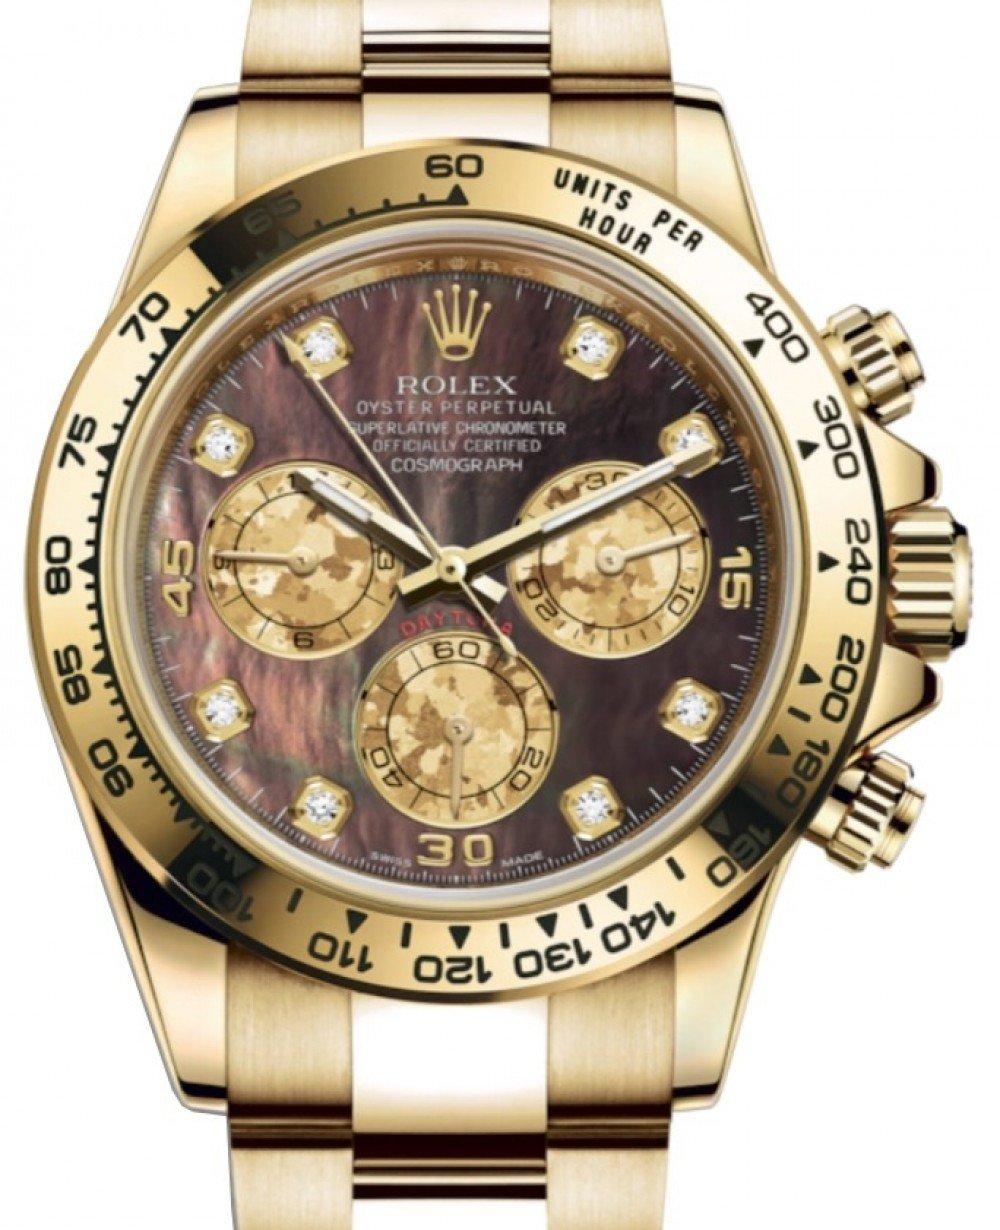 Rolex Cosmograph Daytona 116508 Dark Mother Of Pearl Diamond